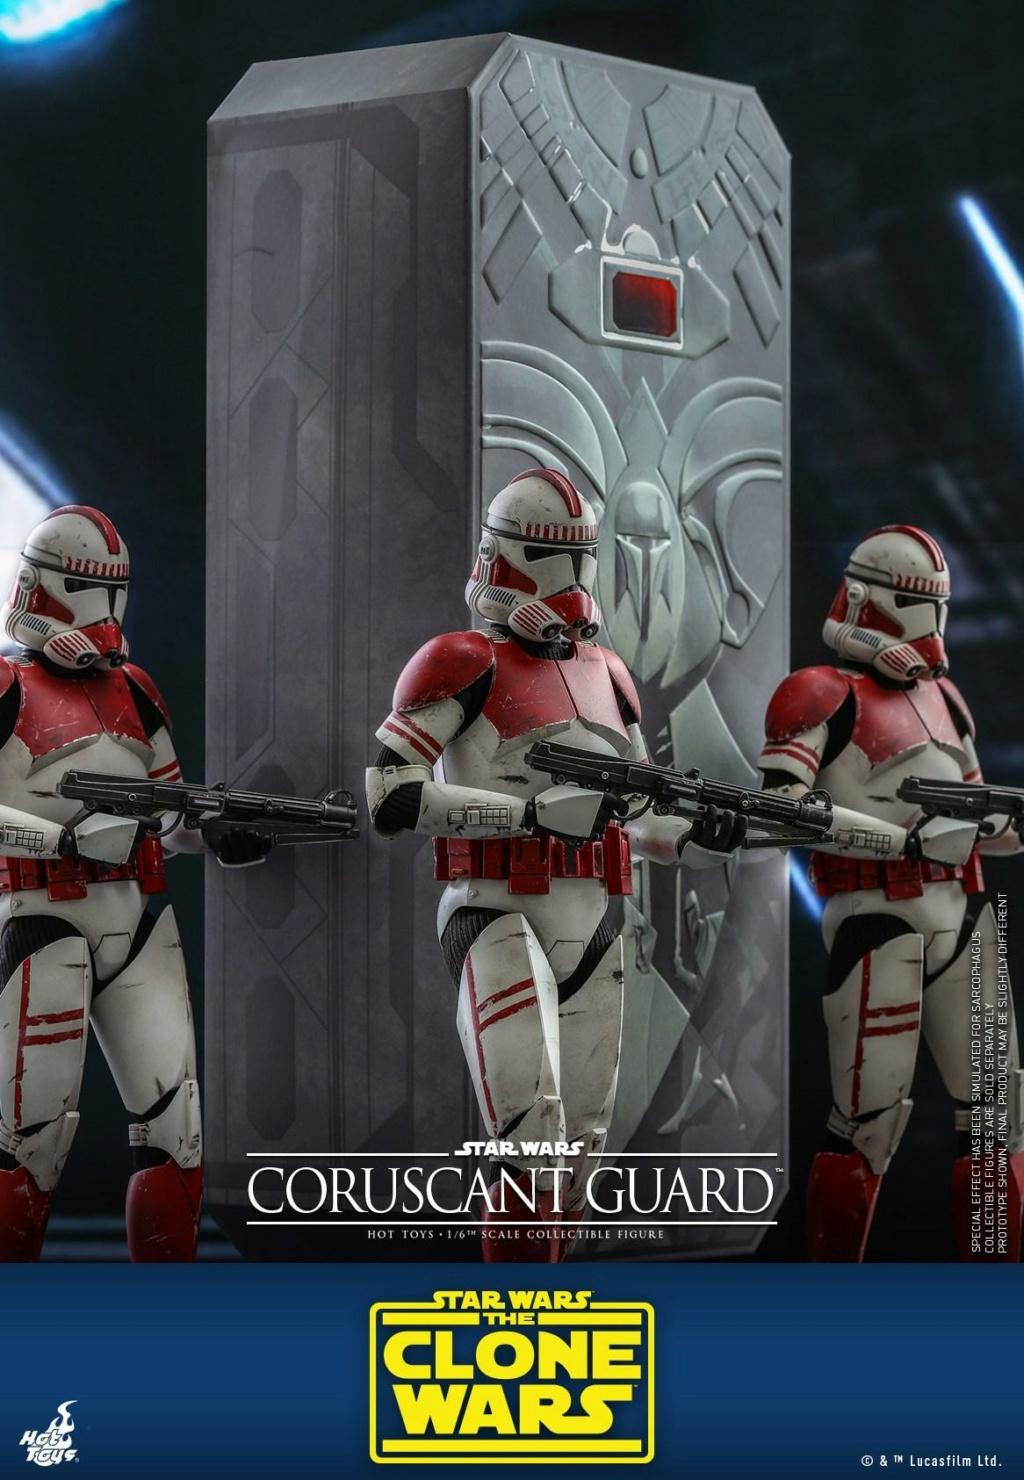 Coruscant Guard - 1/6th Figure - The Clone Wars - Hot Toys Corusc16